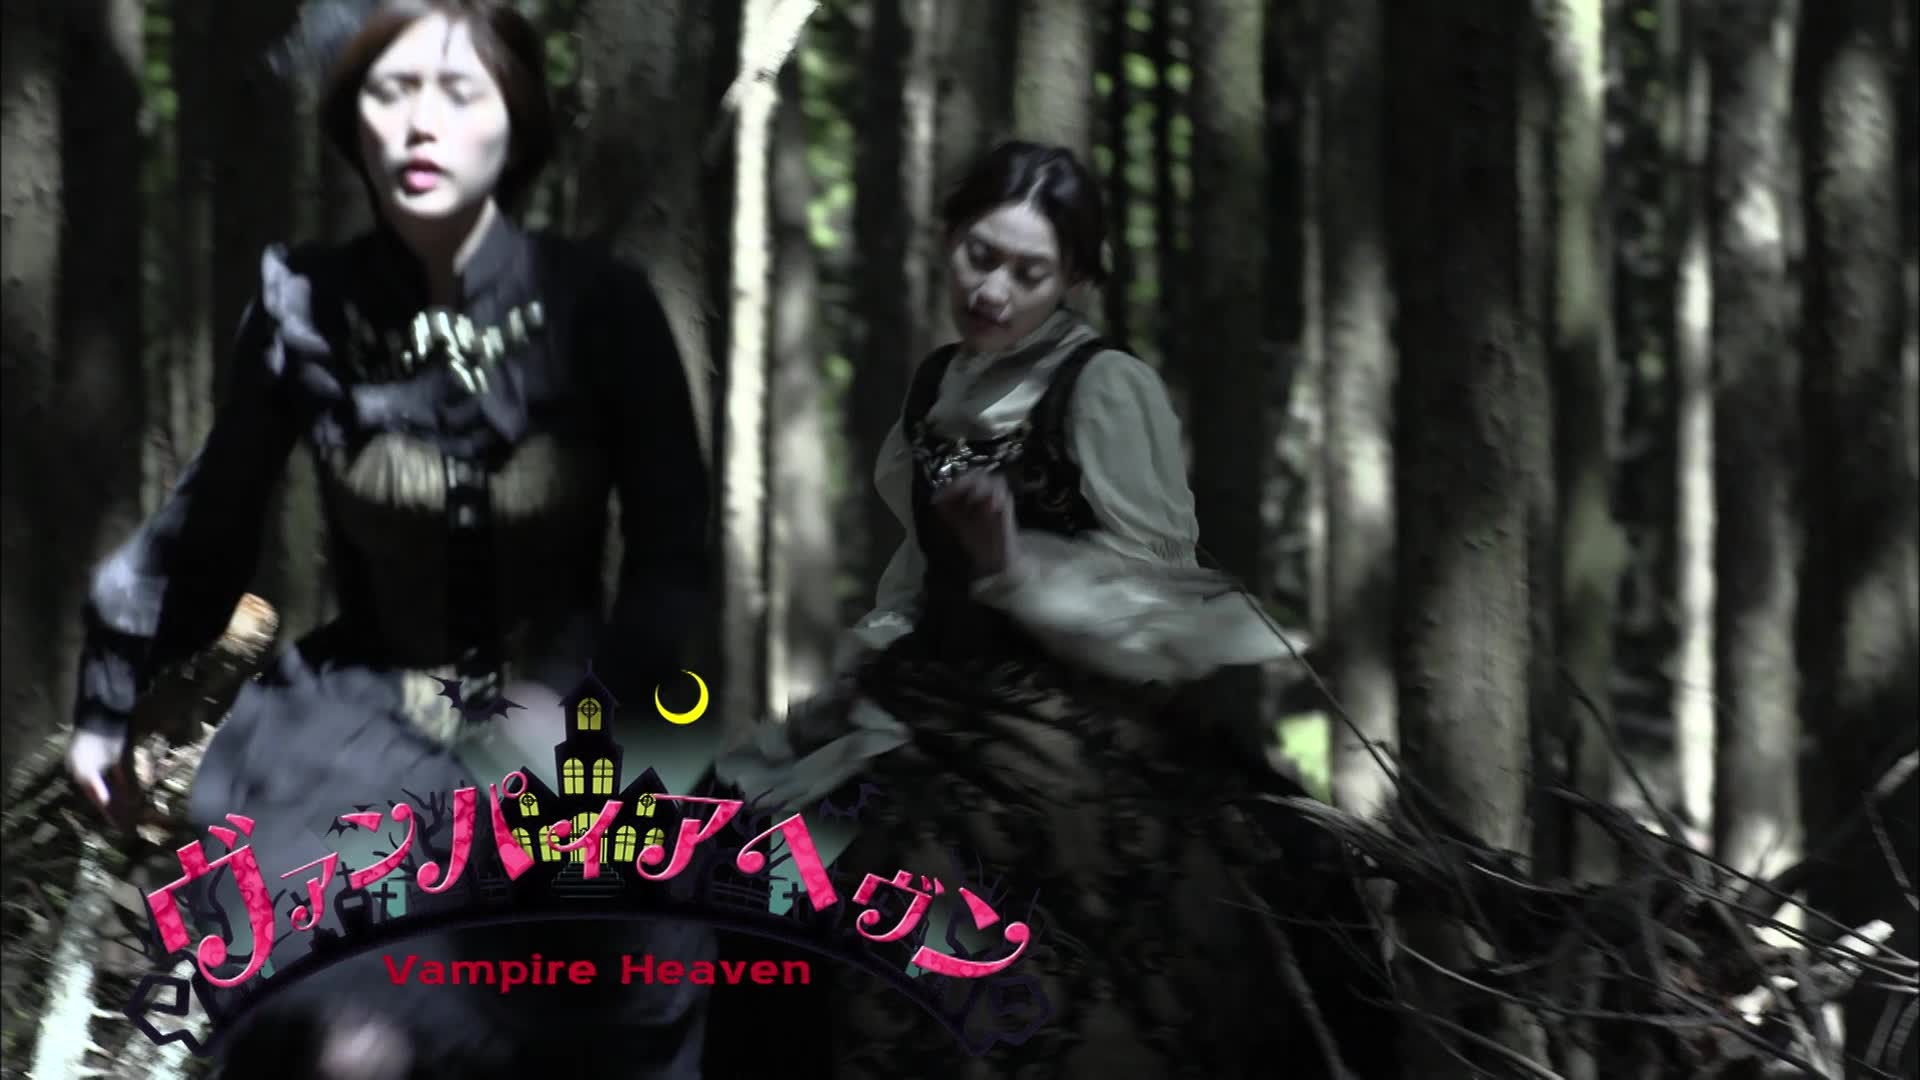 Trailer 2: Vampire Heaven